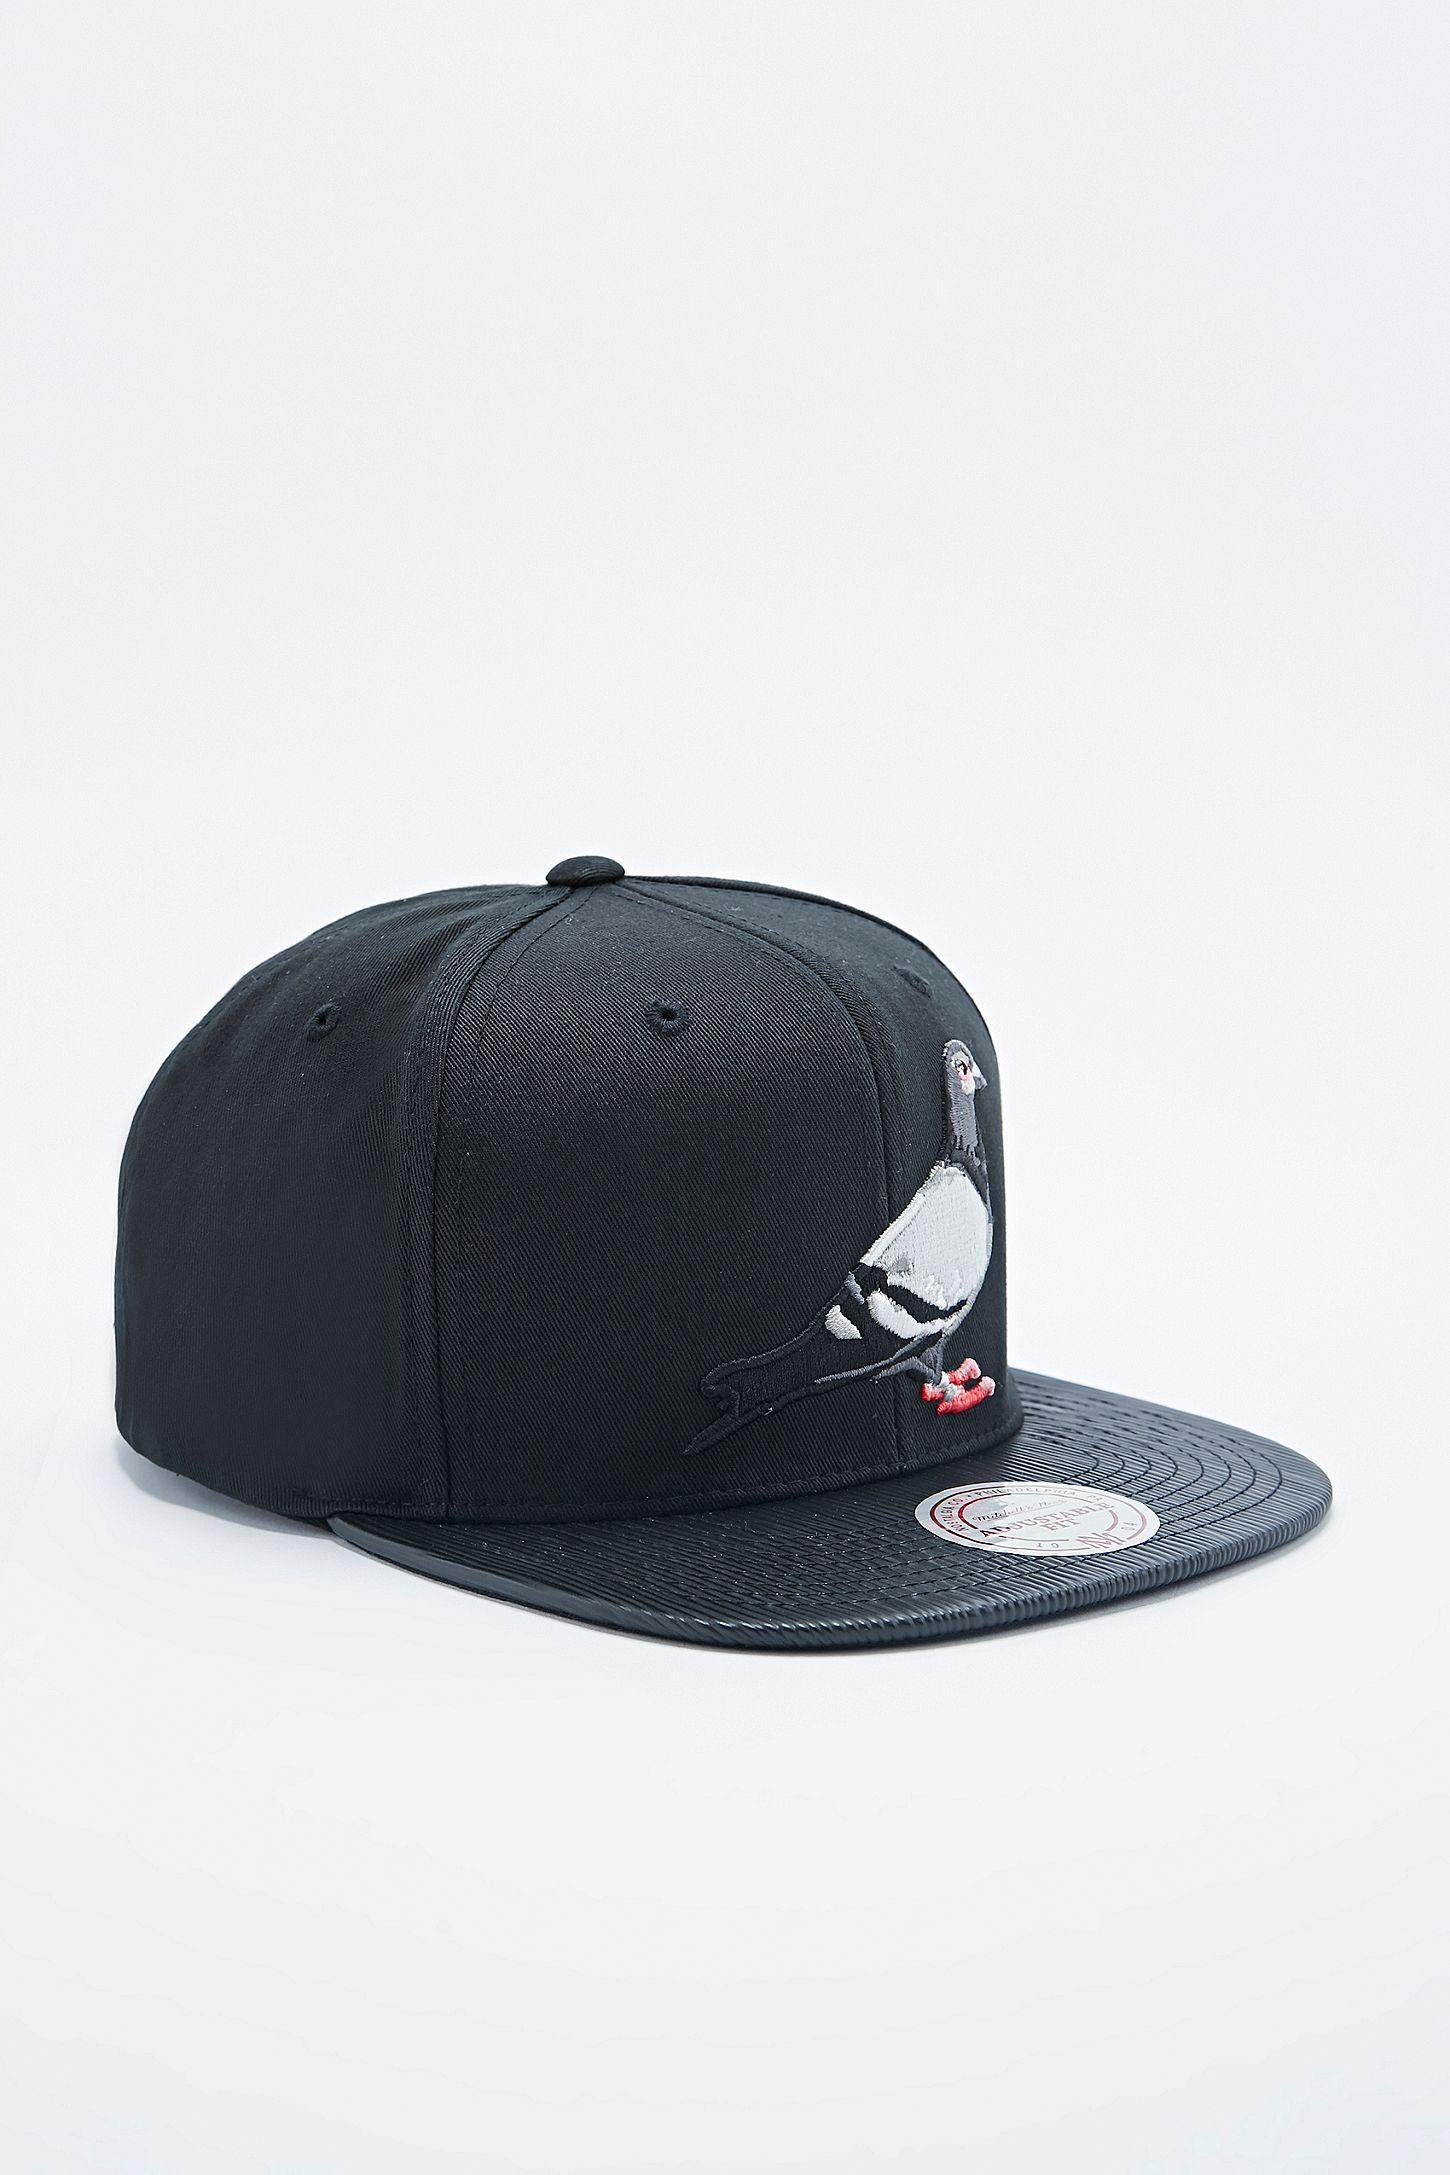 9252ab0da00b7 Staple Pigeon Snapback Cap in Black